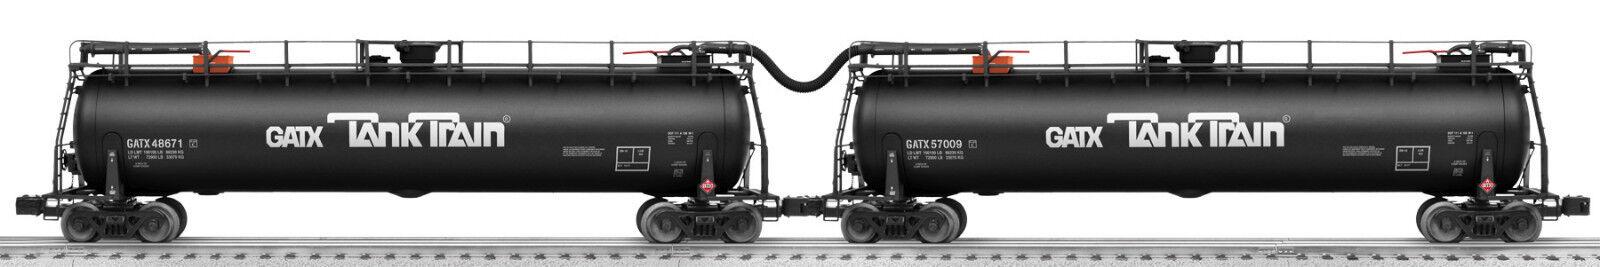 Tren Lionel 6-29774 GATX Tanque coche intermedio o escala 2-CAR Pack Conjunto de petróleo